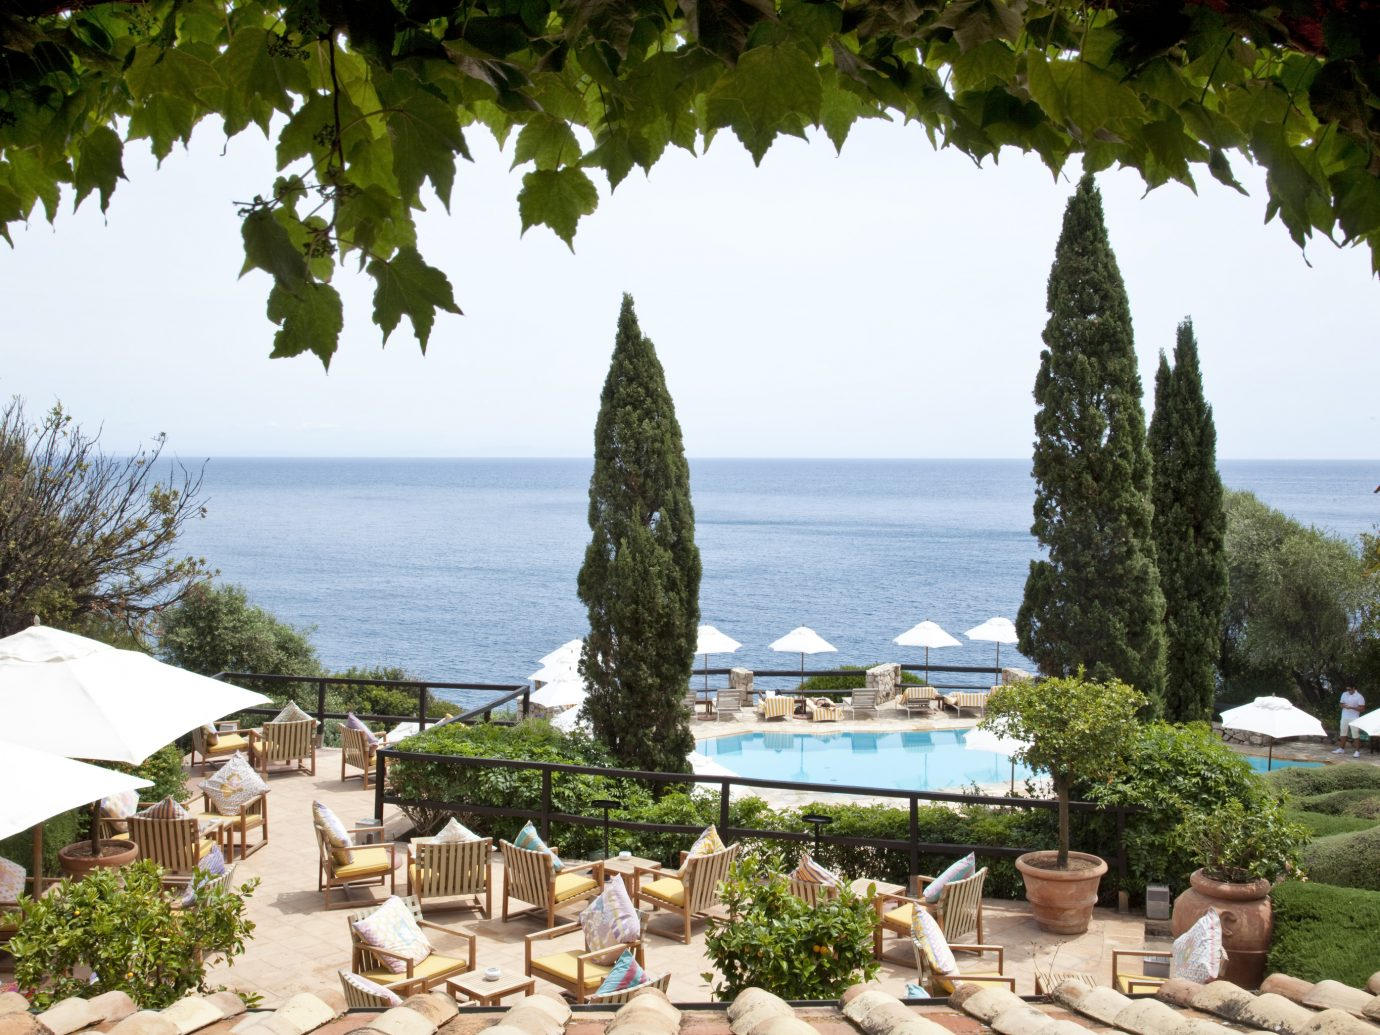 Ocean view from Il Pellicano